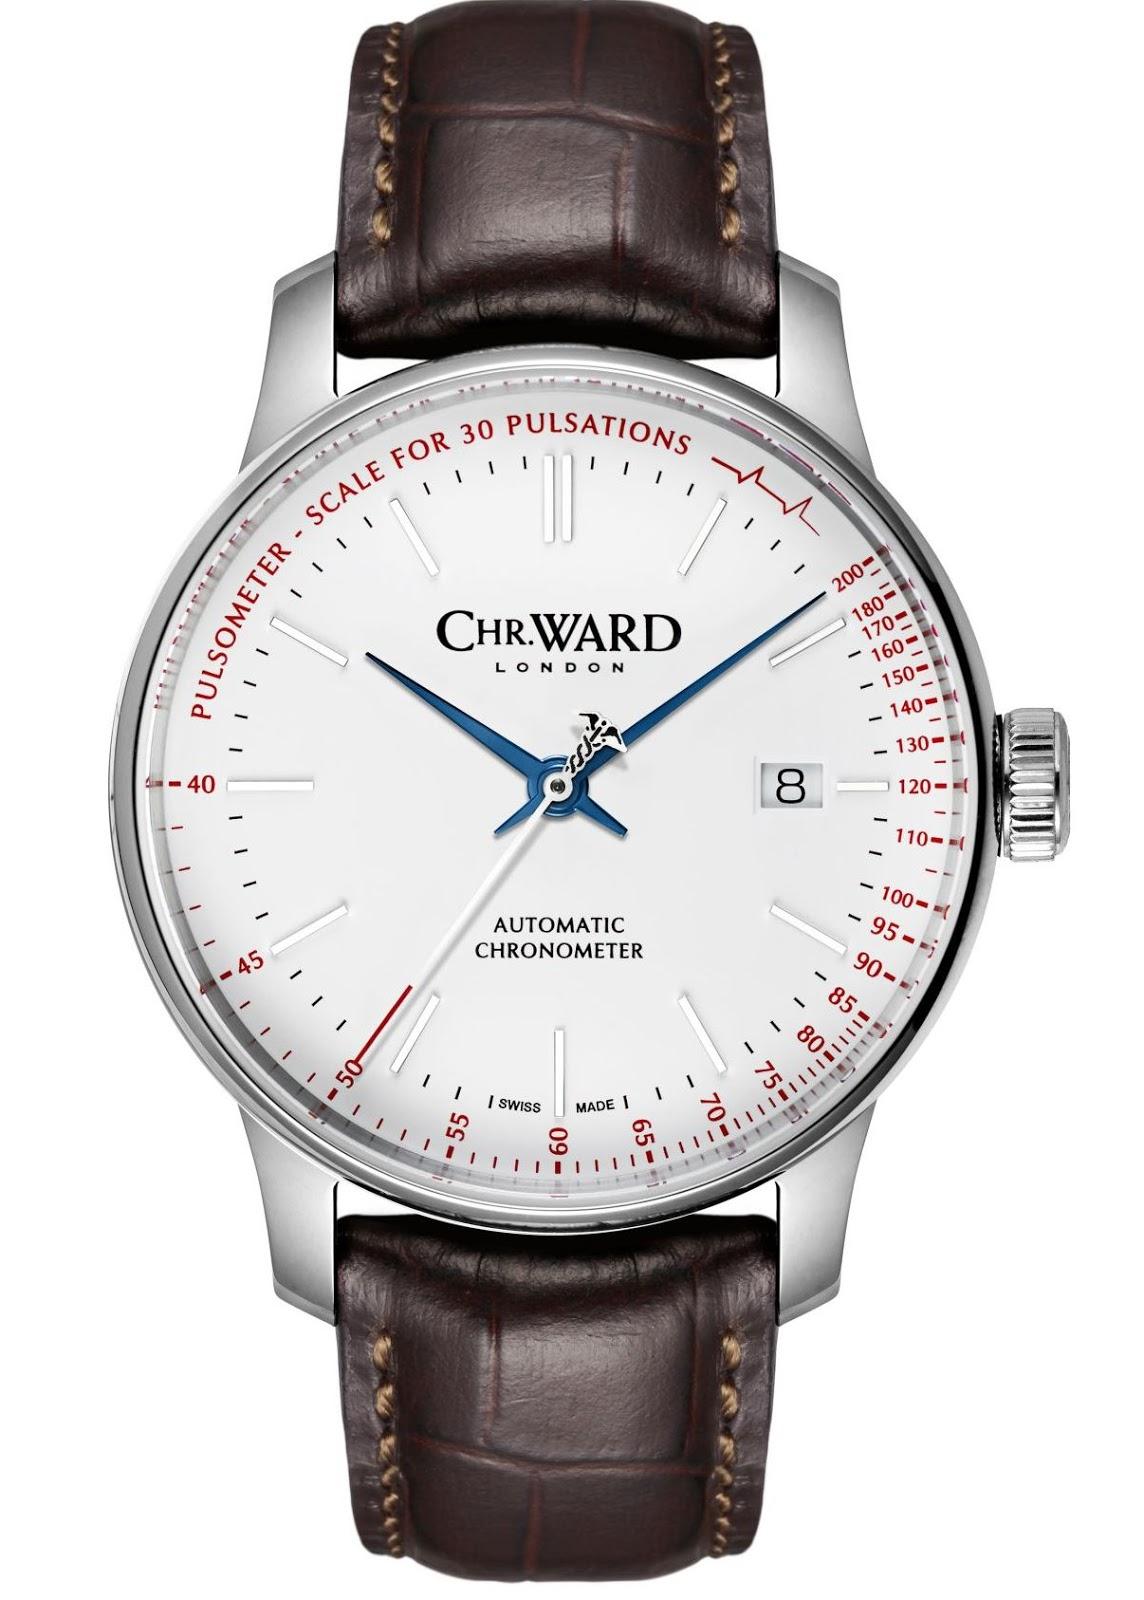 neue uhr christopher ward c9 pulsometer limited edition chronometer. Black Bedroom Furniture Sets. Home Design Ideas